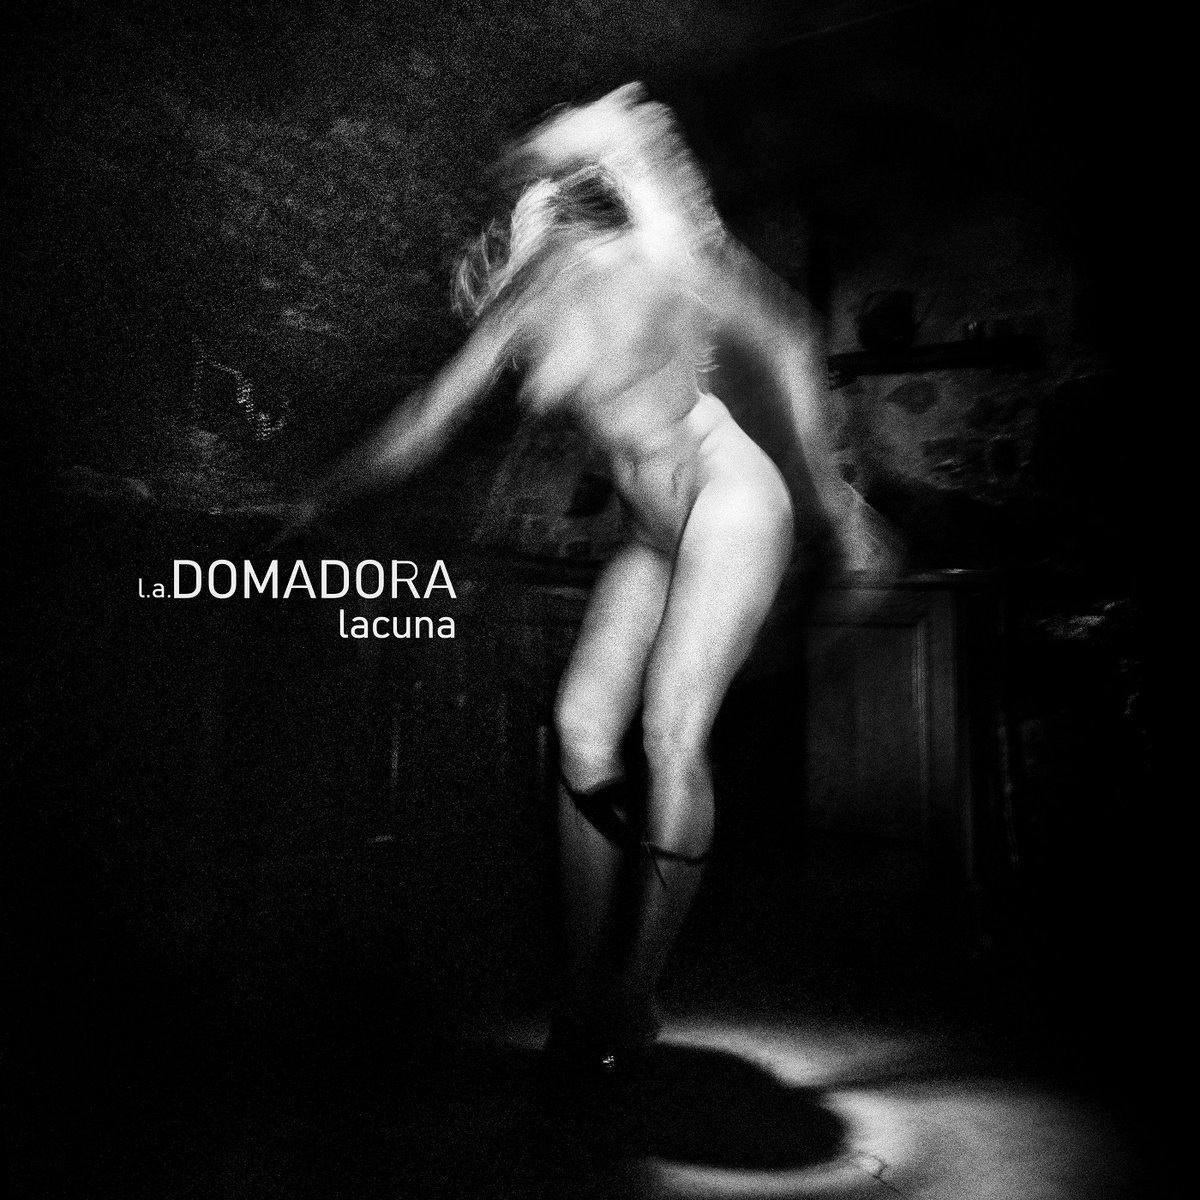 Domadora - Lacuna